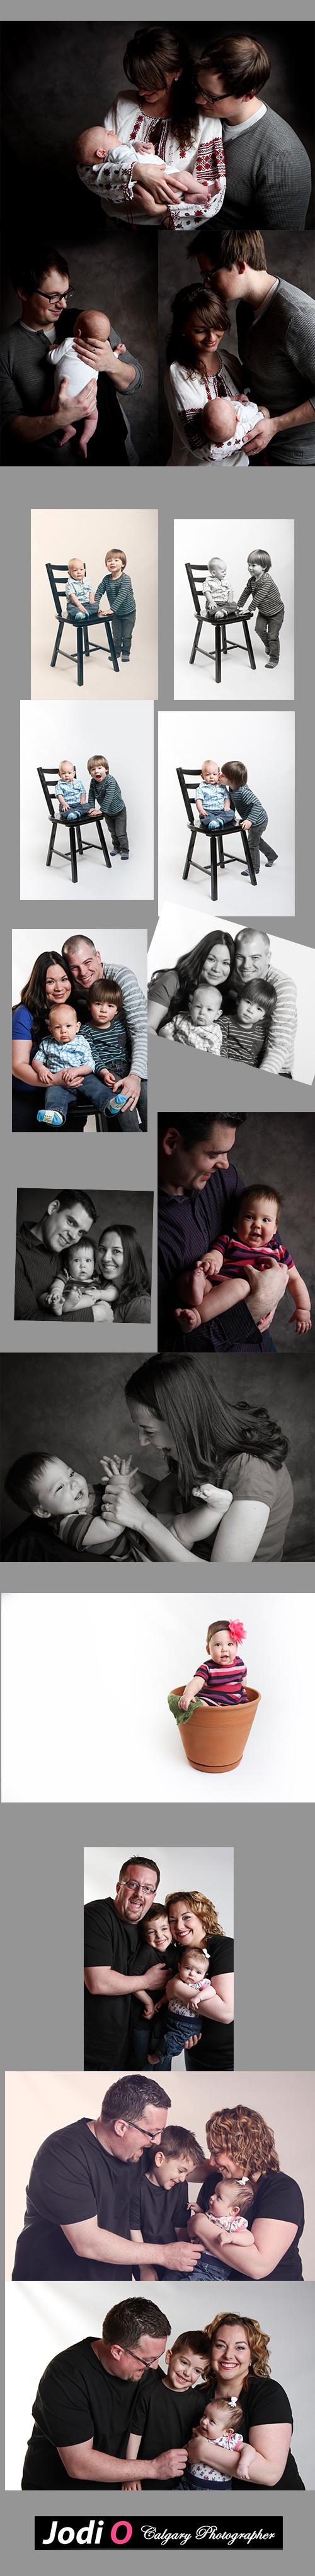 CalgaryFamilyPhotographer